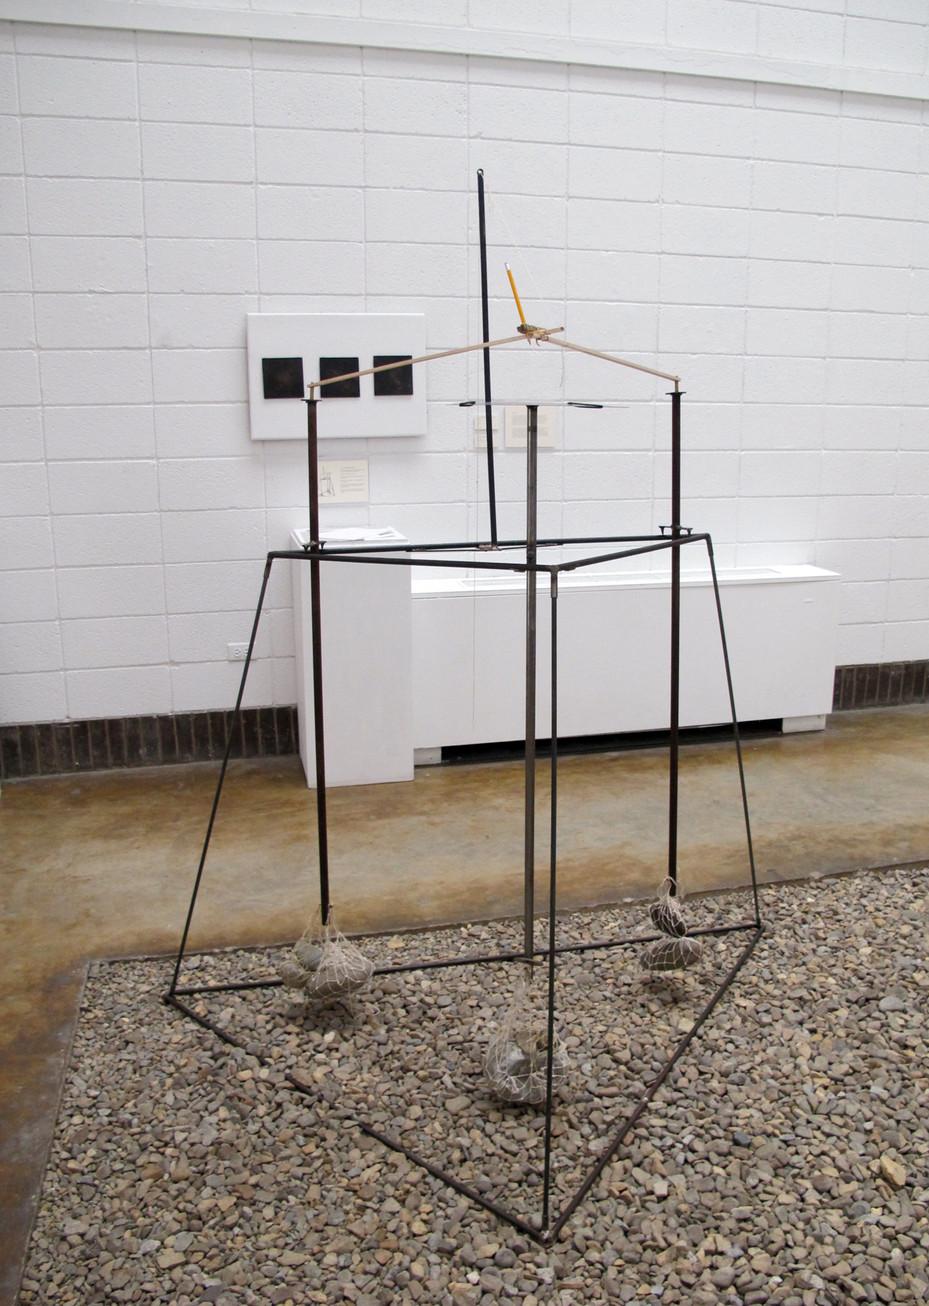 Pendulum Drawing Machine